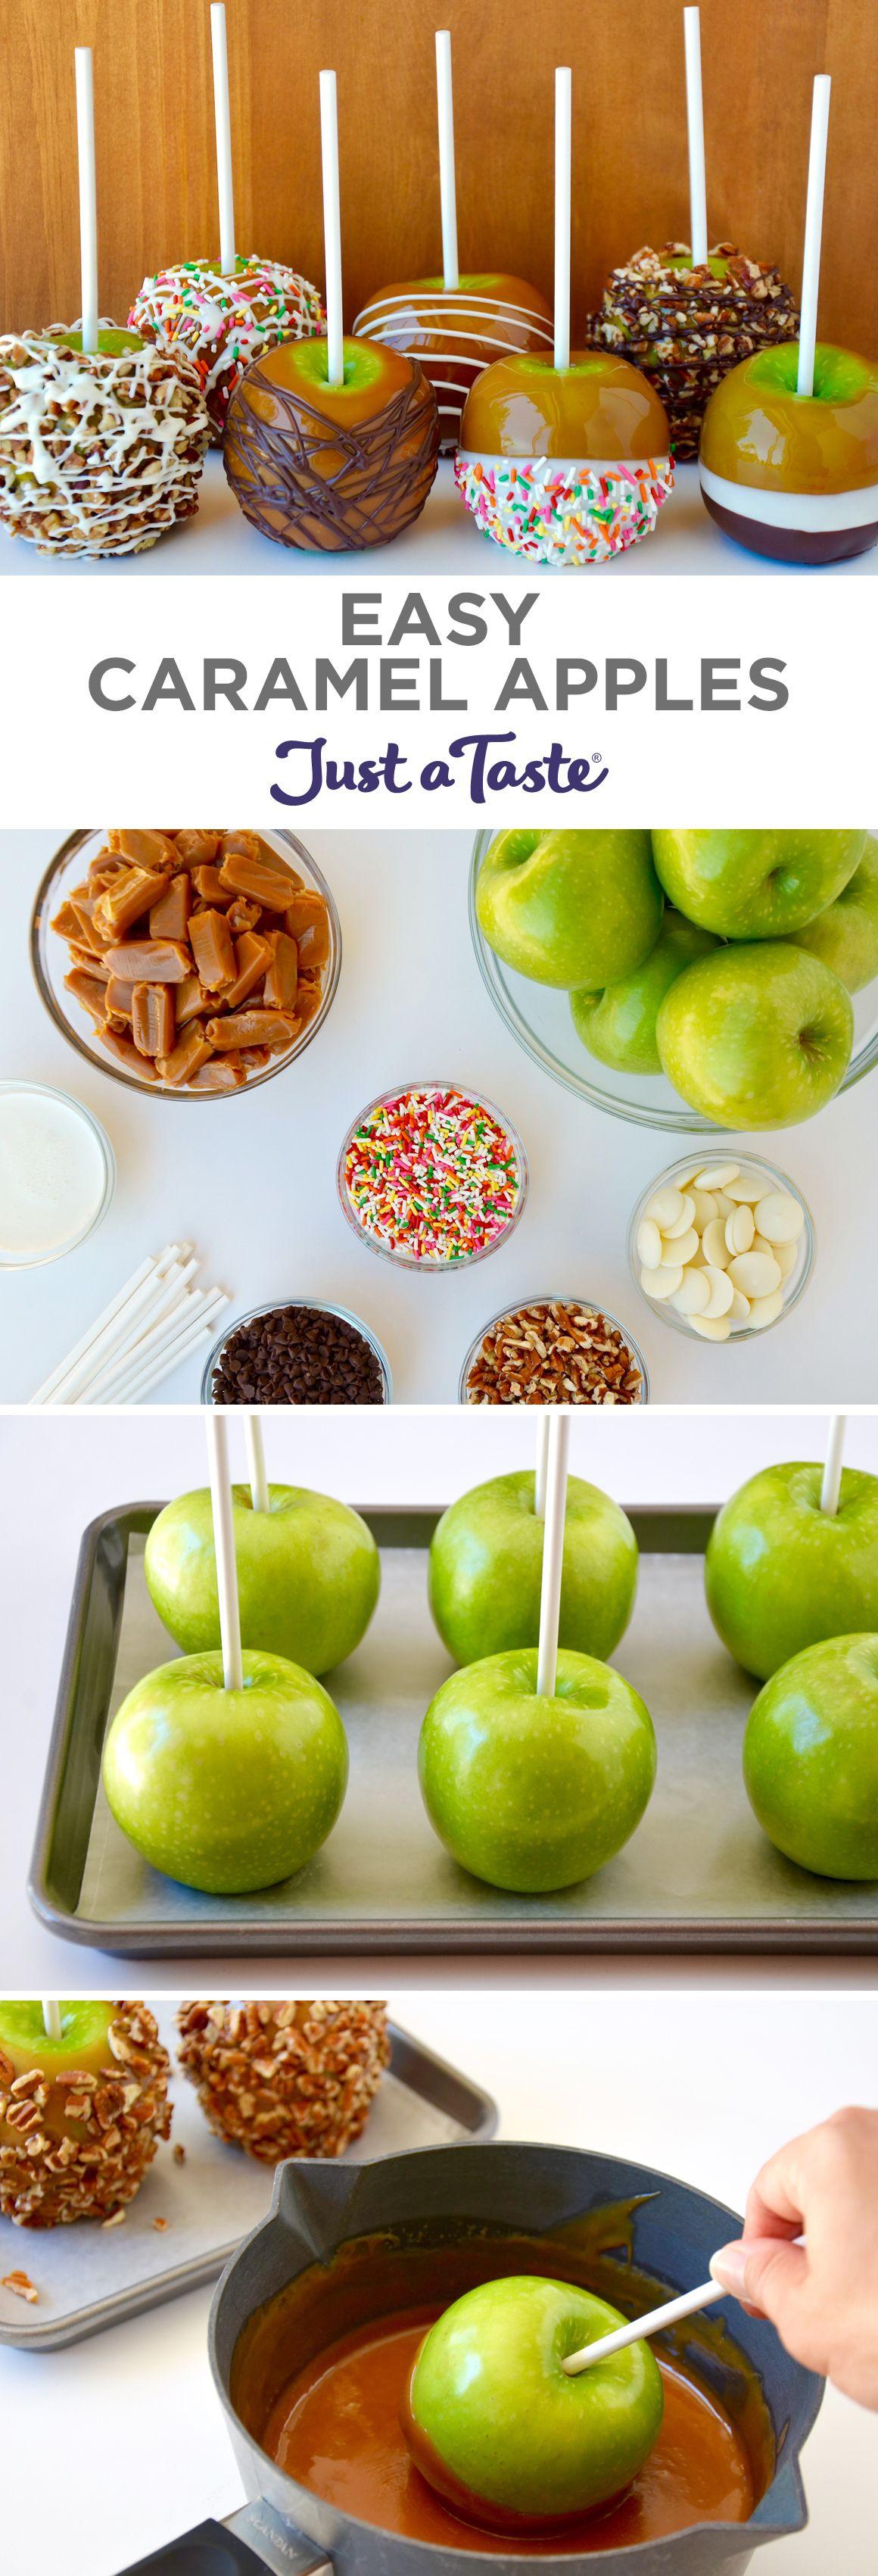 Easy Caramel Apples Recipe Caramel apples, Caramel and